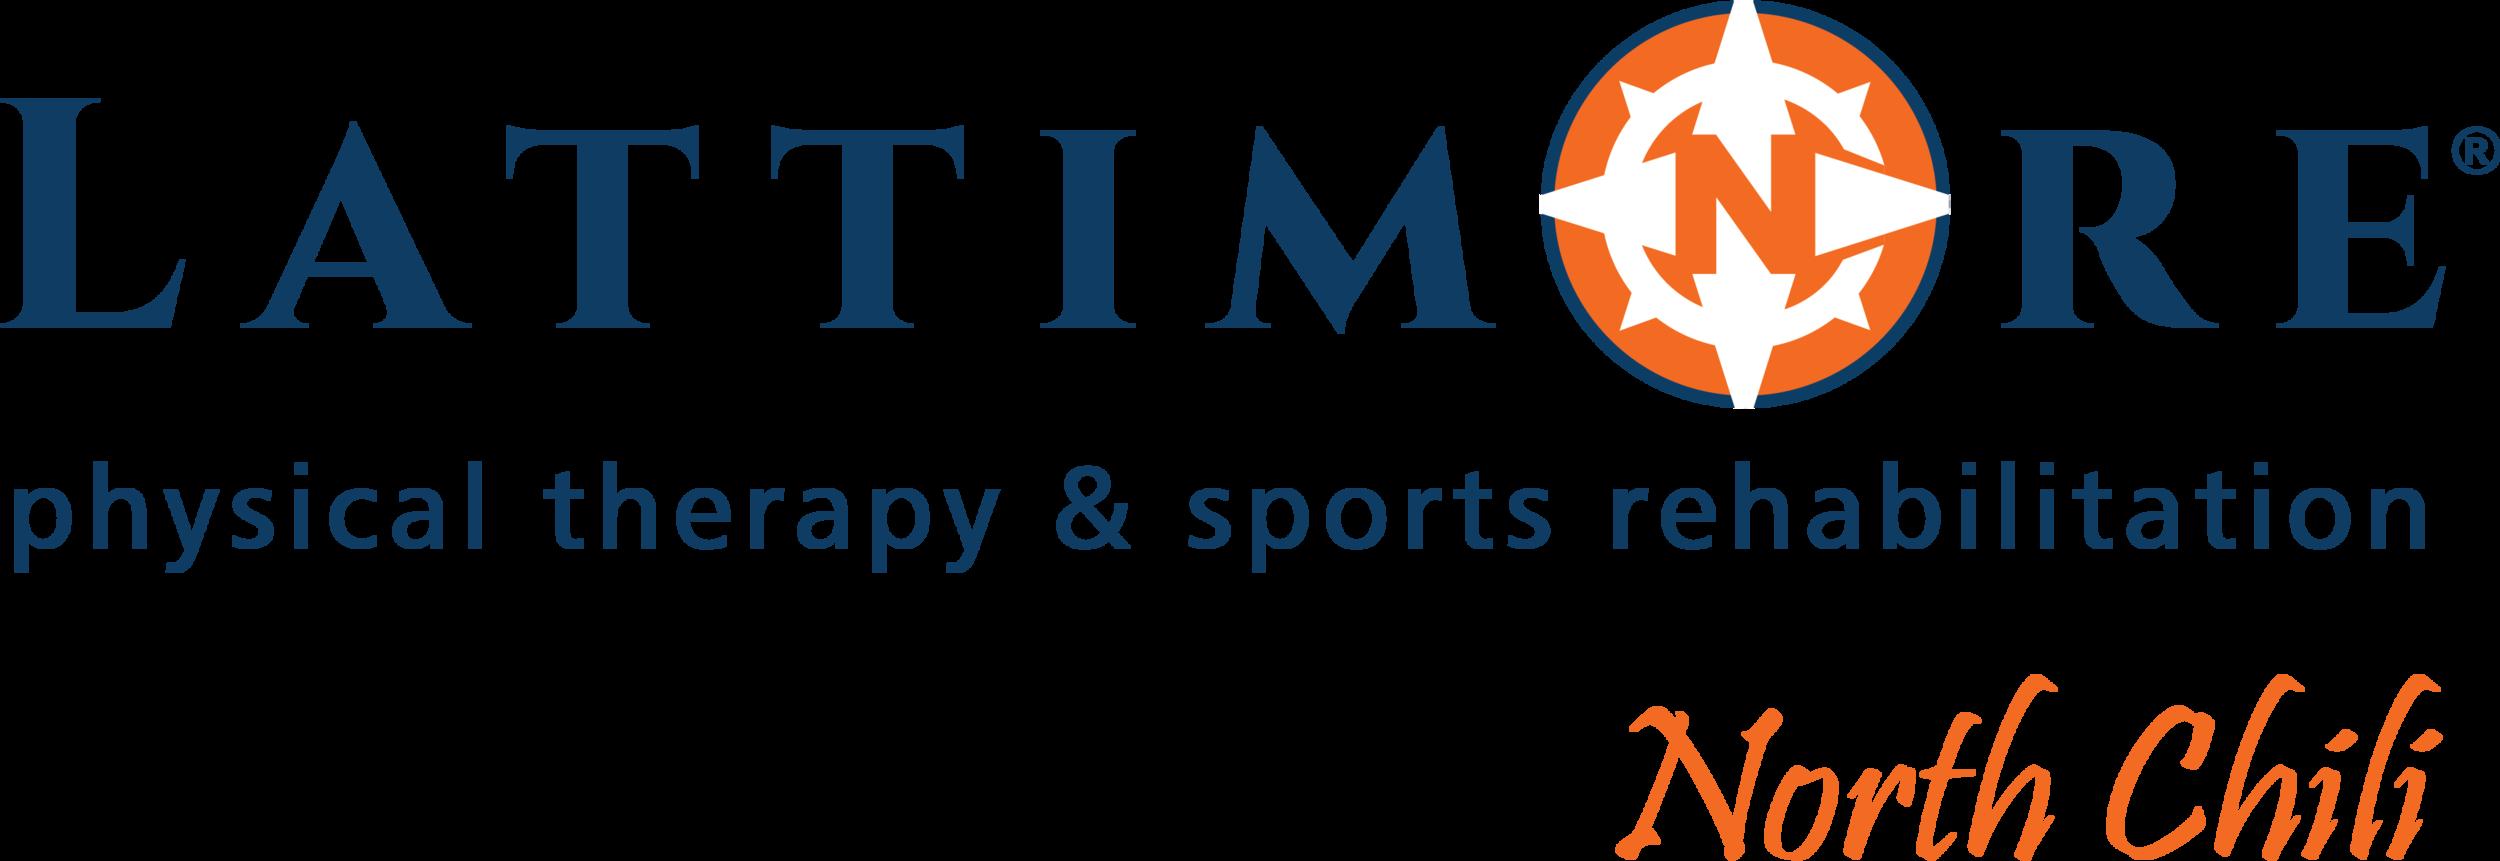 2019-05_Lattimore-Logo-North Chili.png